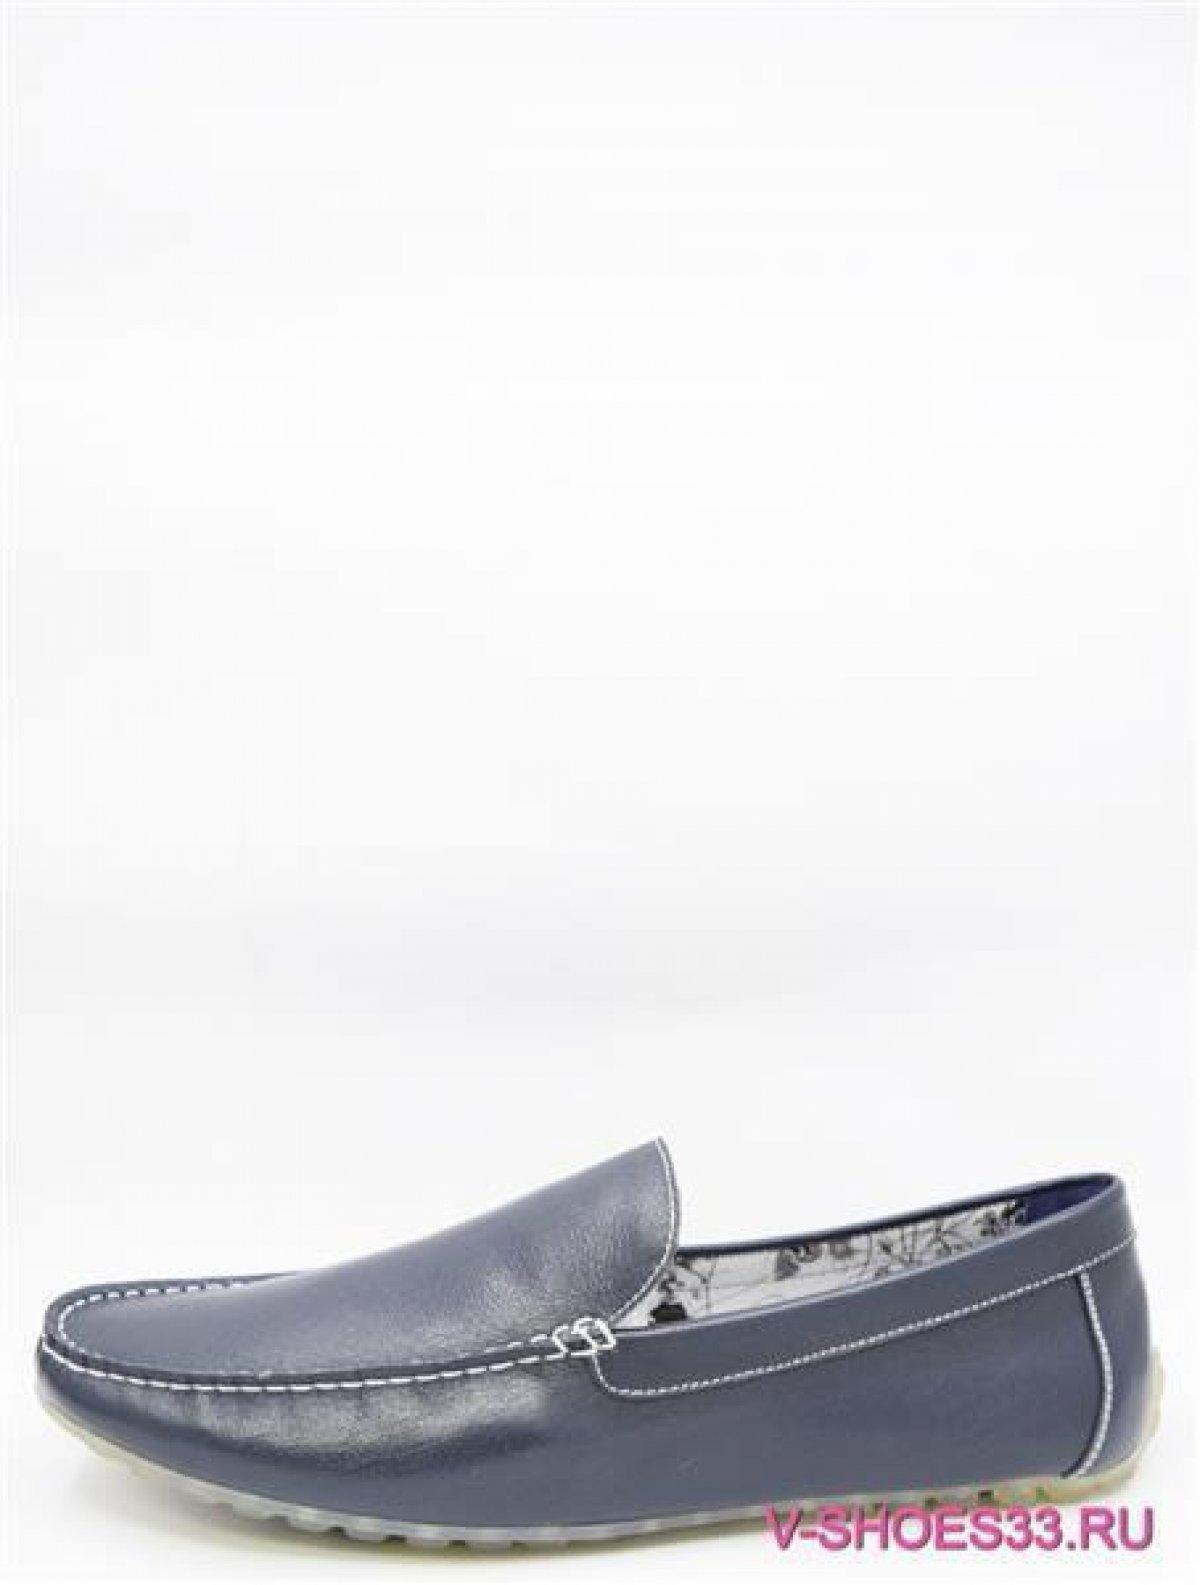 K87-075389 туфли мужские